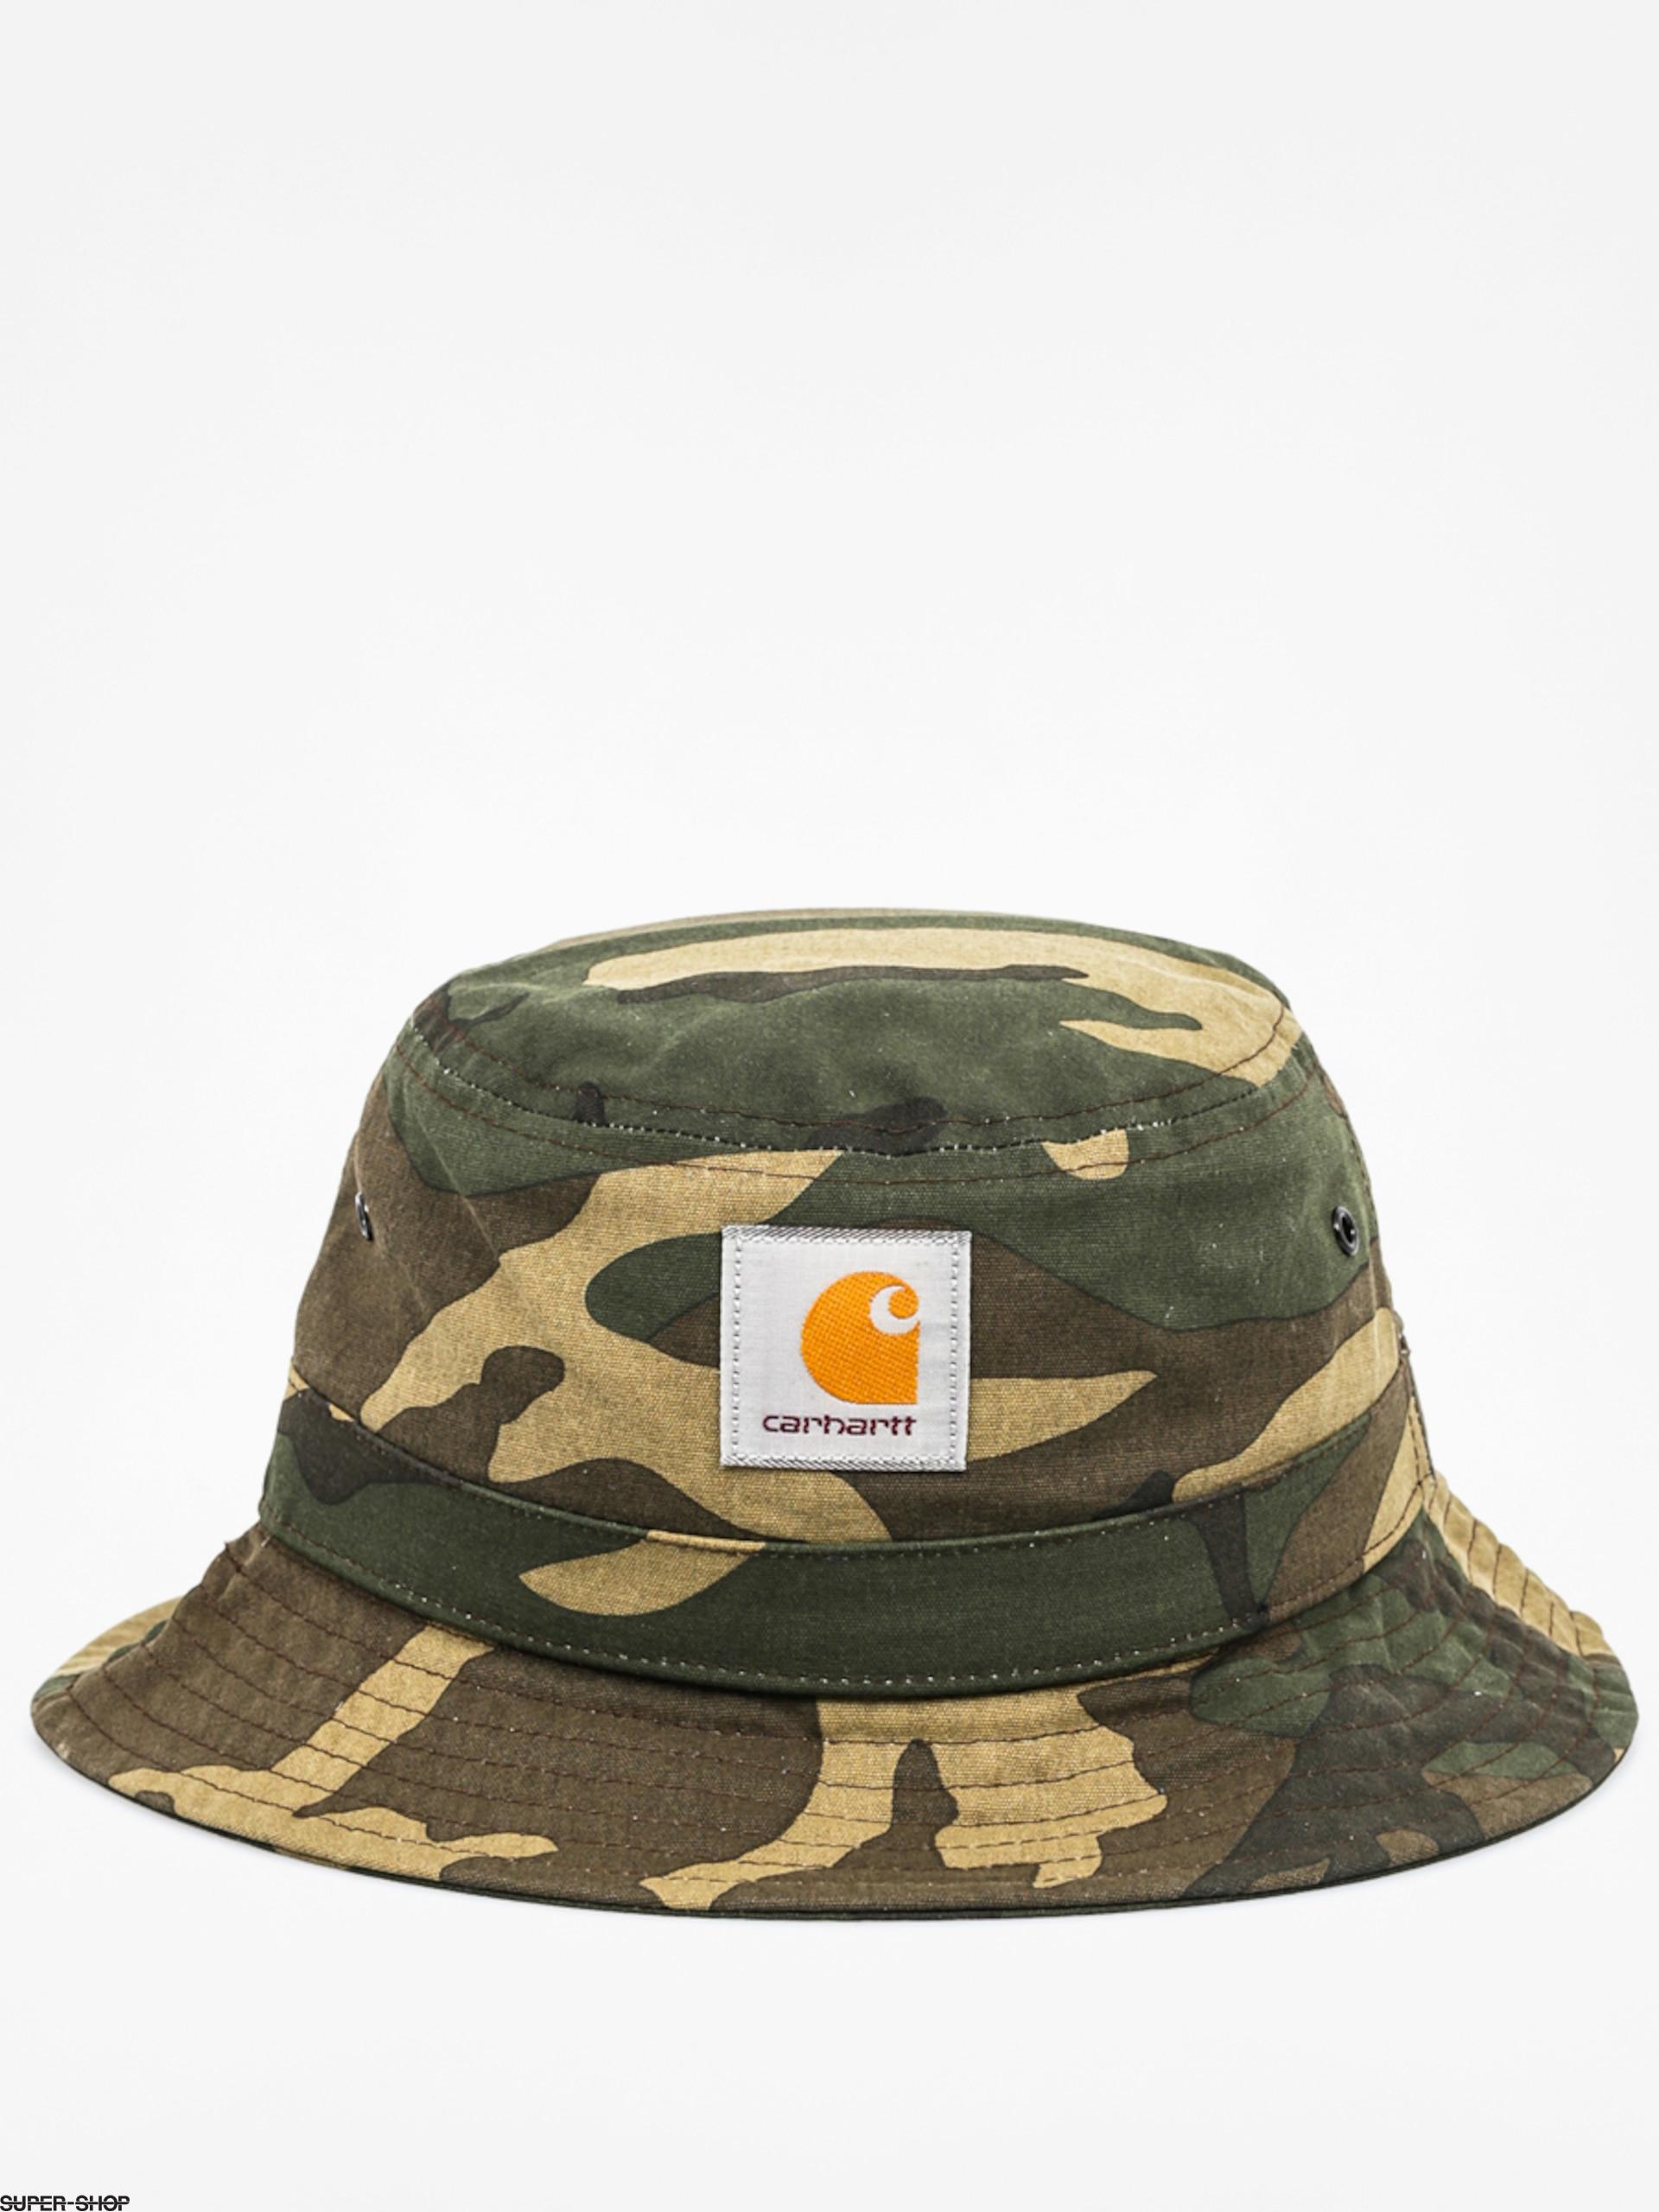 e57f4d22539 799373-w1920-carhartt-hat-watch-bucket-camo-laurel.jpg